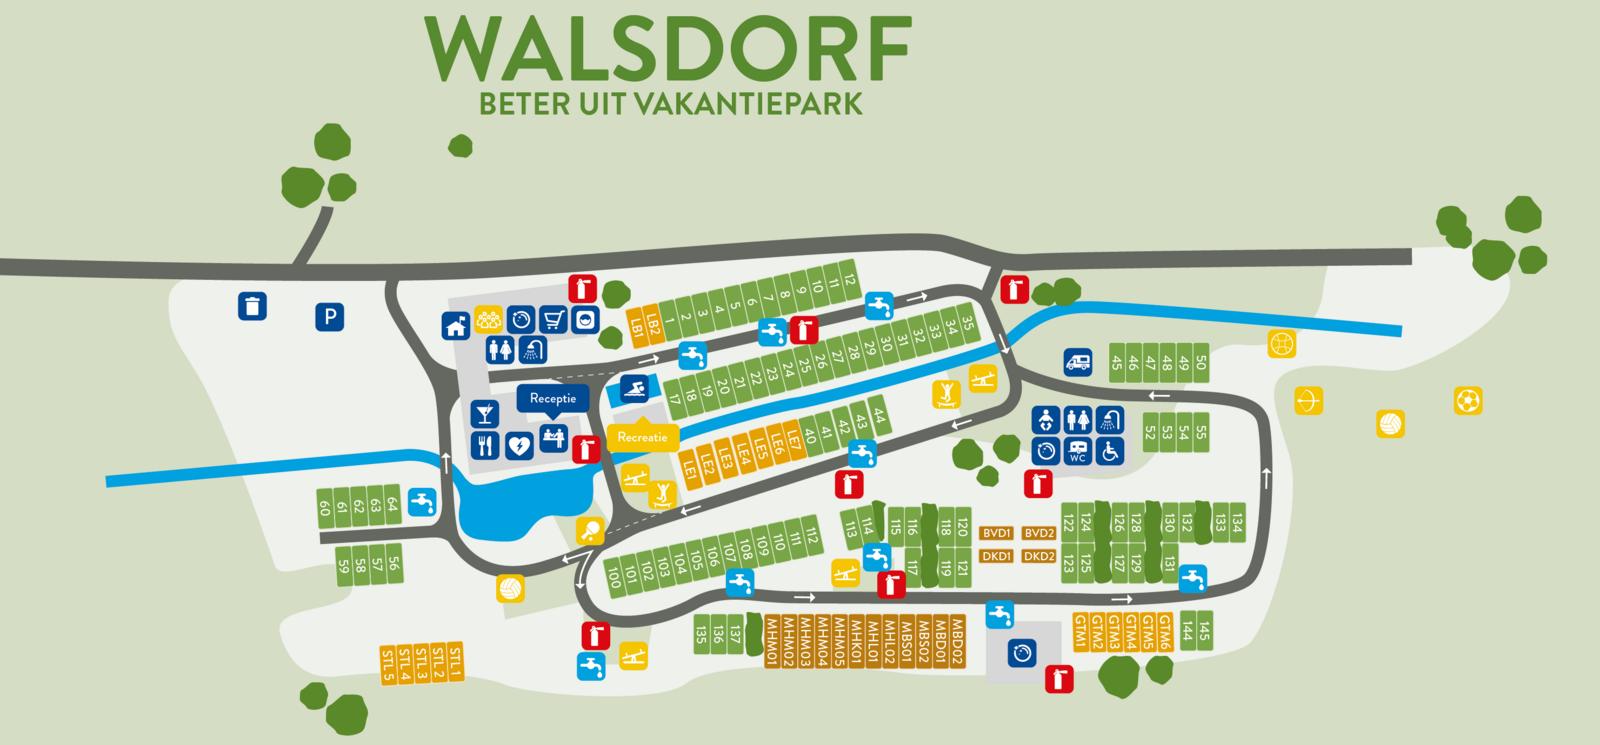 Map of Walsdorf